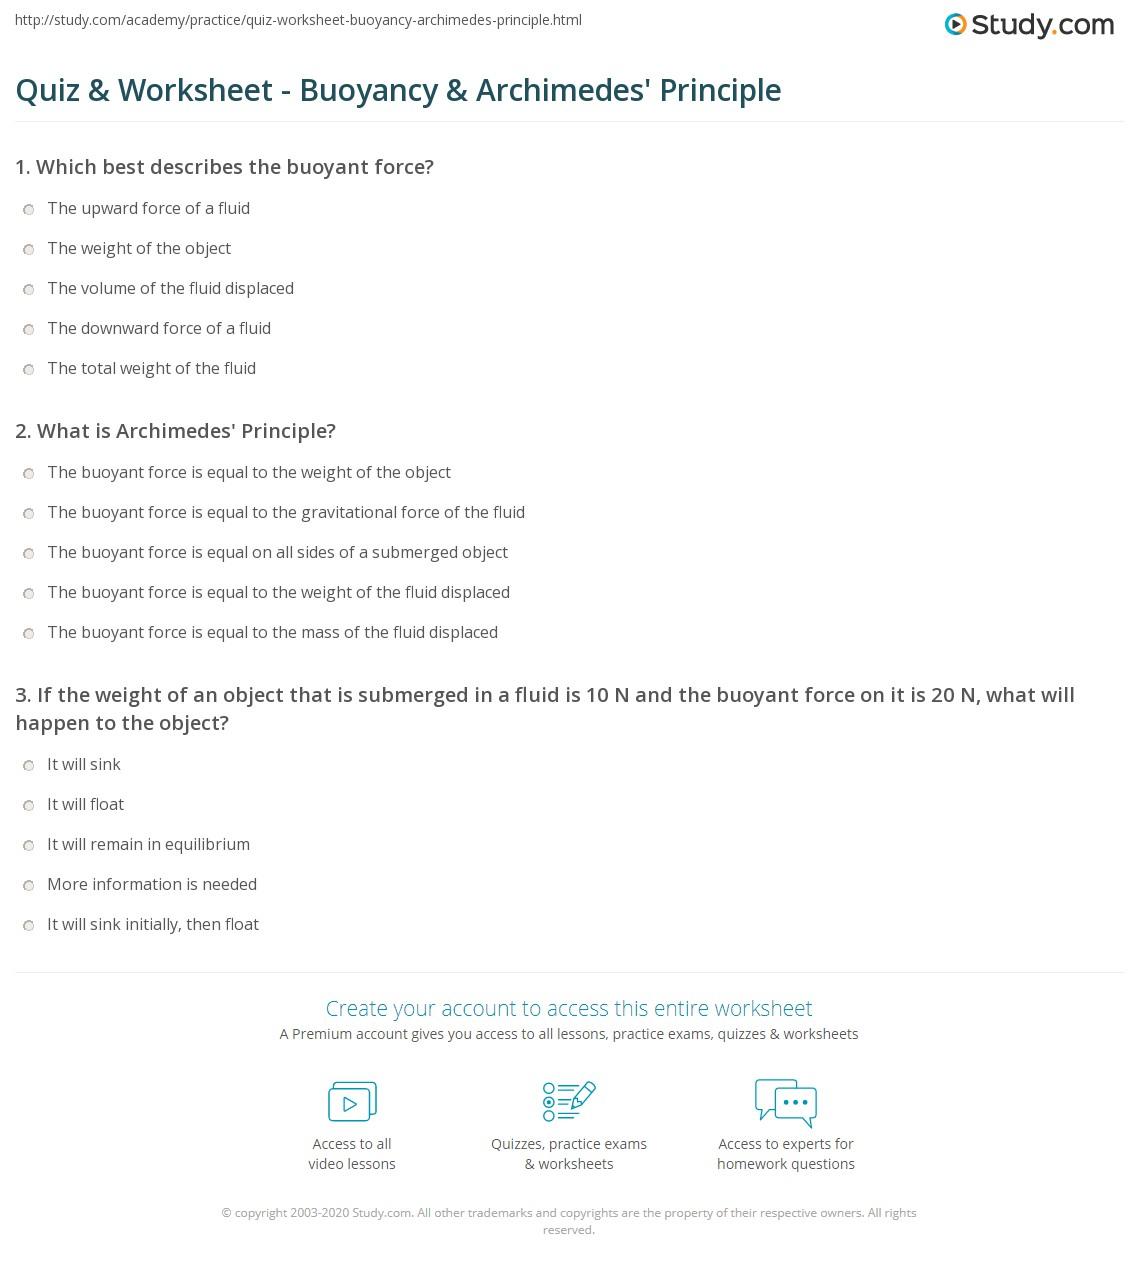 hight resolution of Quiz \u0026 Worksheet - Buoyancy \u0026 Archimedes' Principle   Study.com